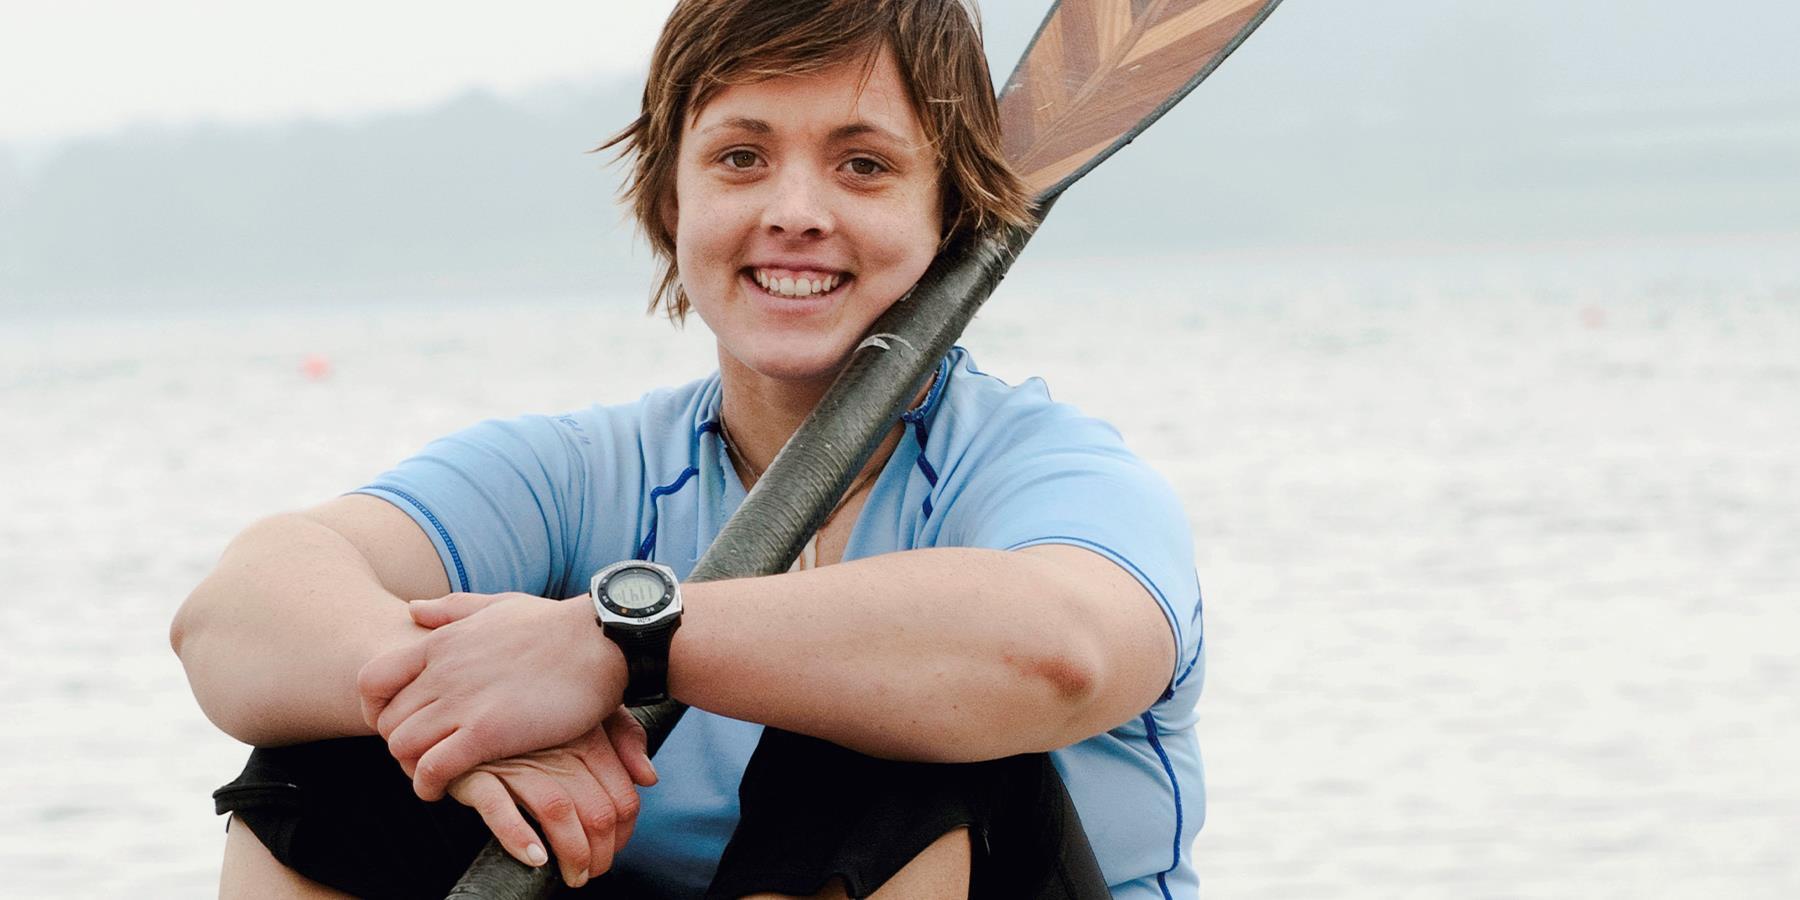 Sarah Outon smiling at Rutland Water